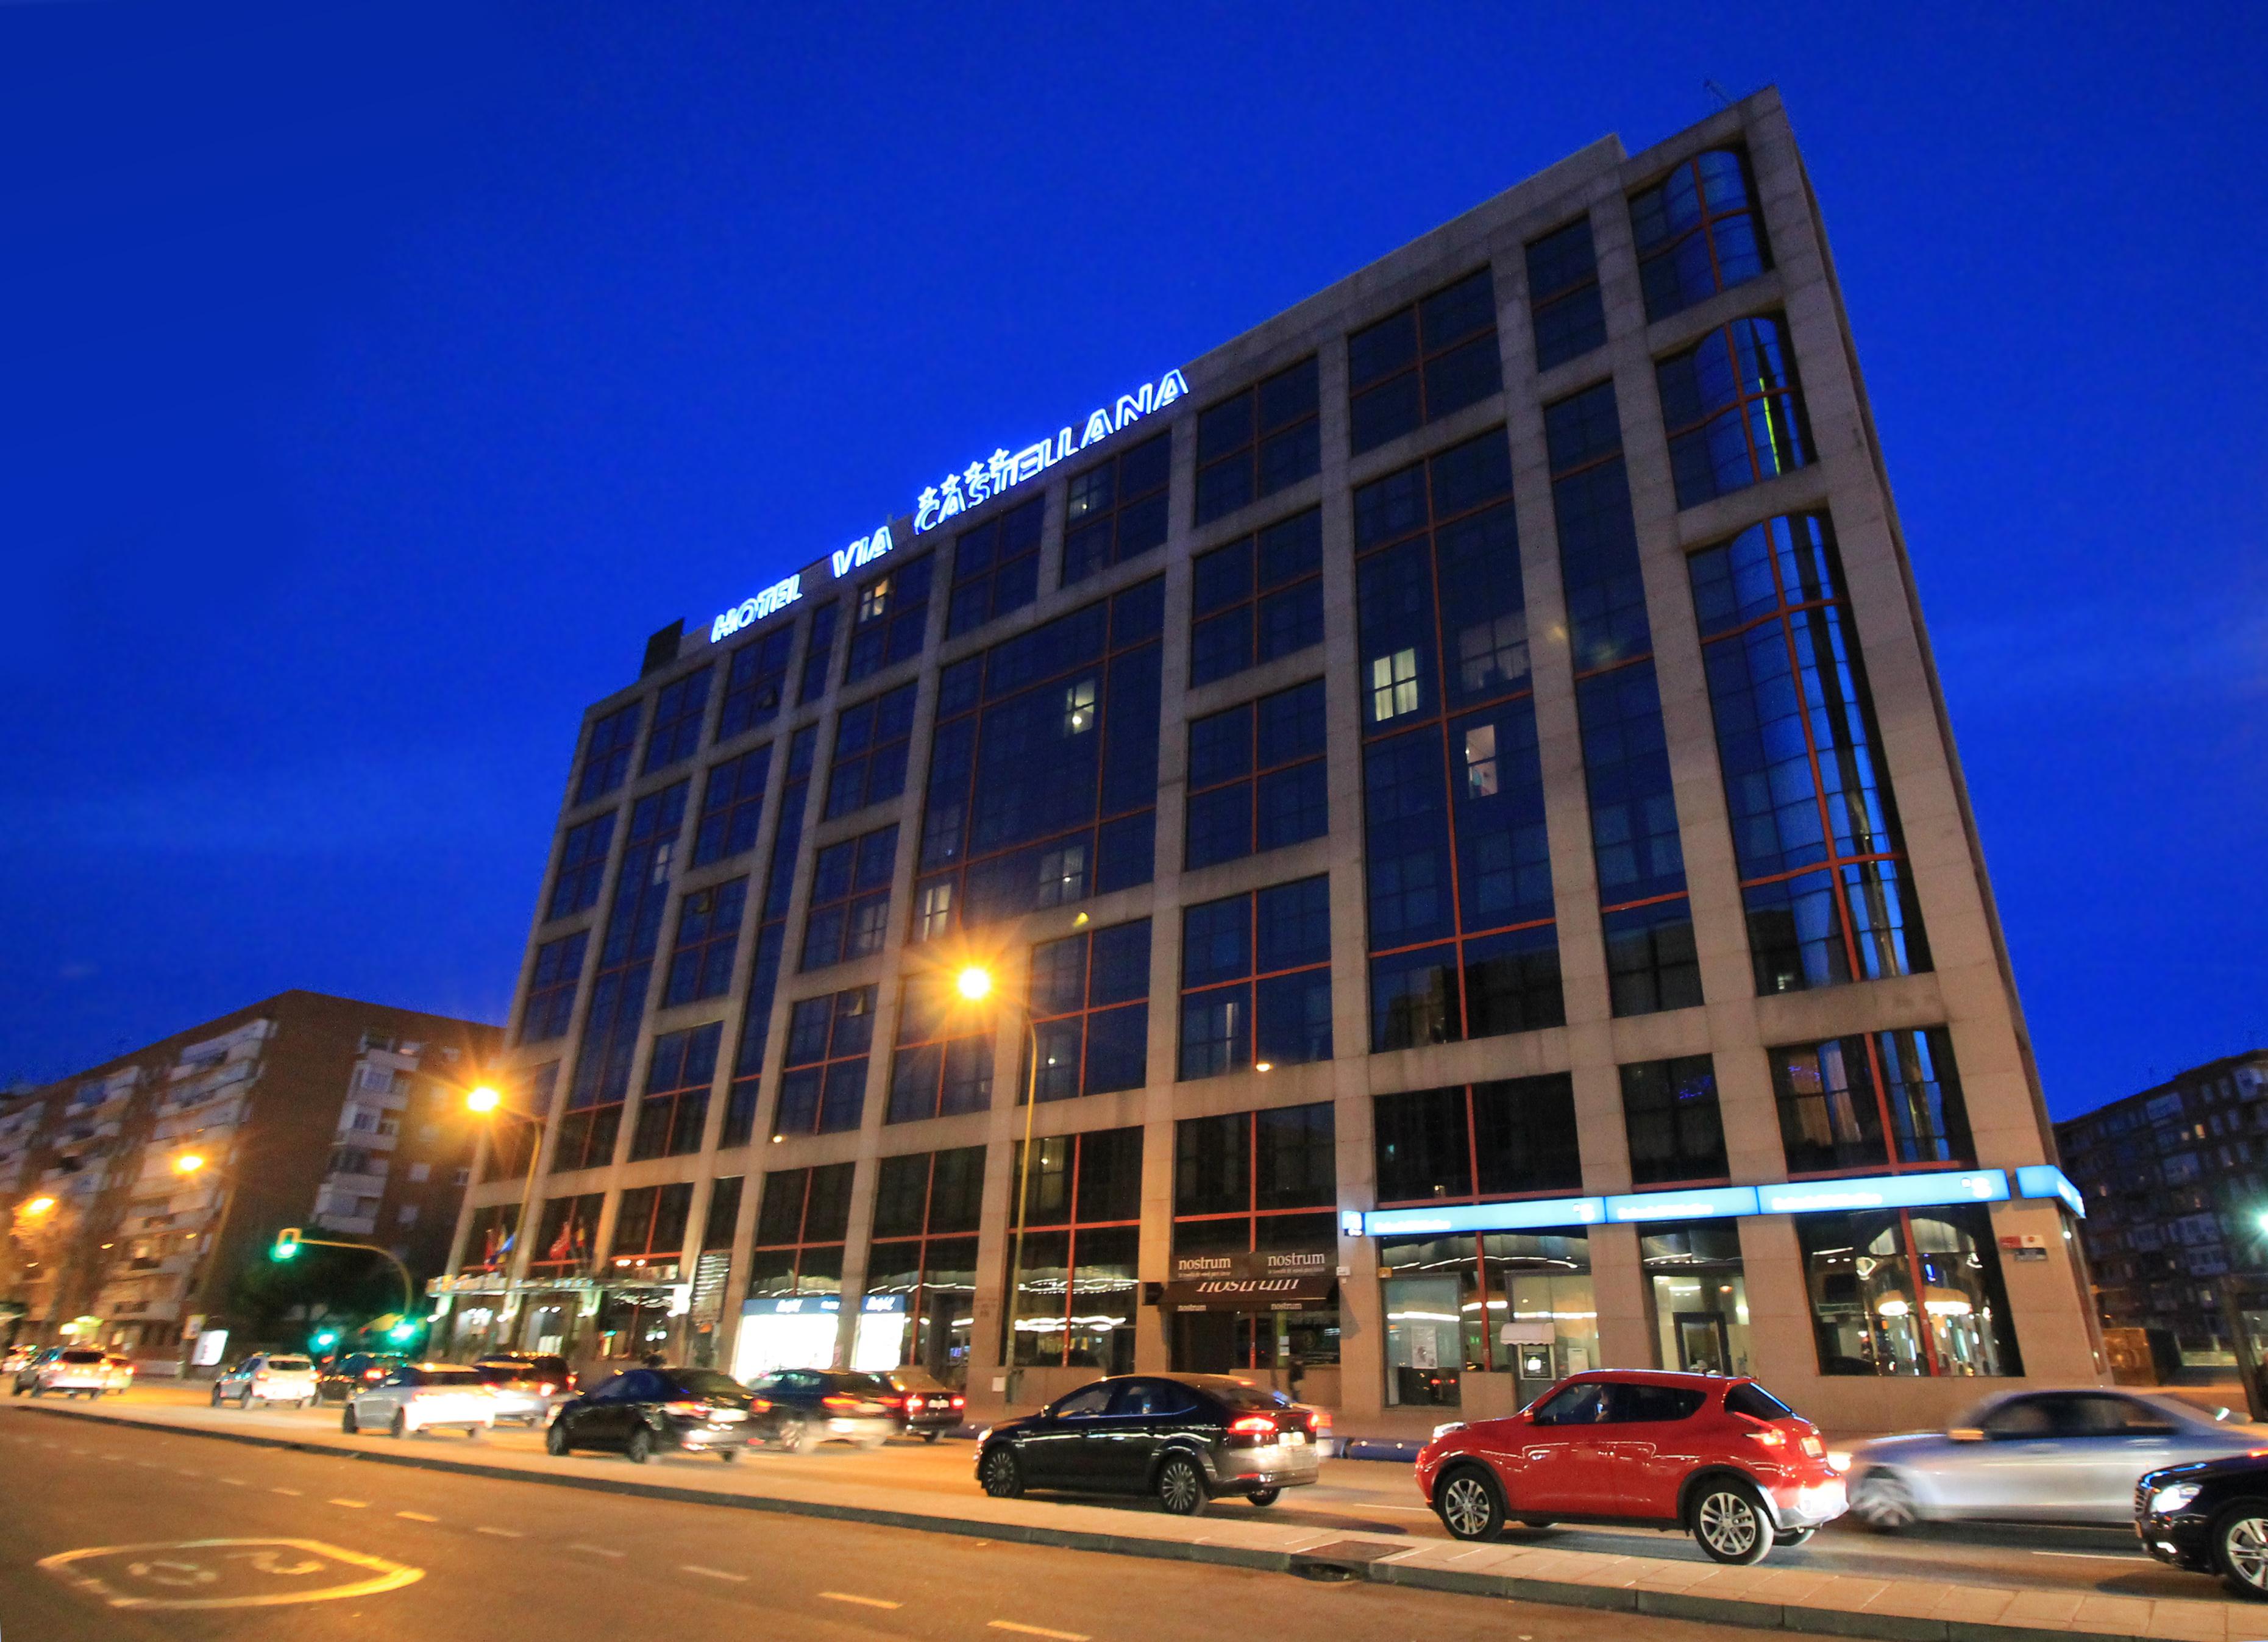 Hotel Via Castellana Madrid Nahe Bahnhof